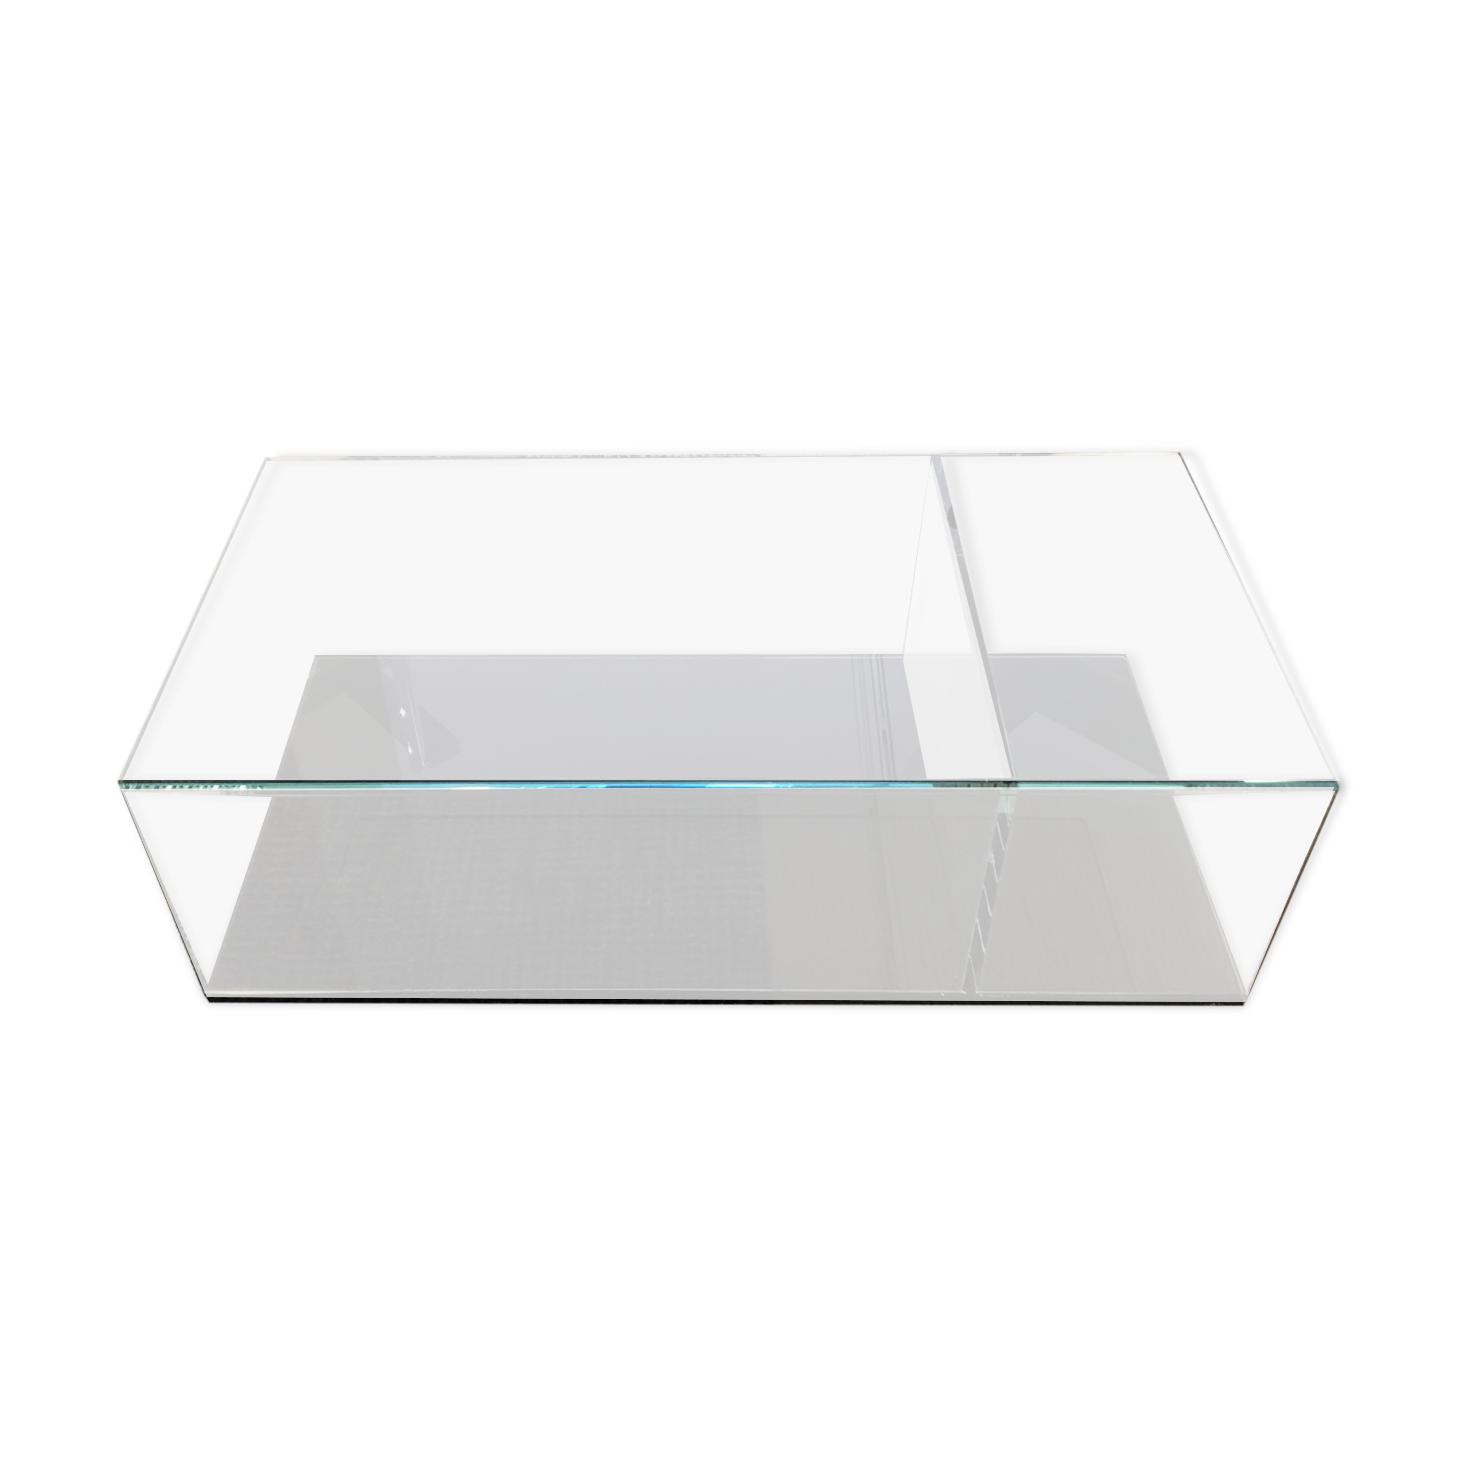 Table basse en verre 269 MEX de Cassina